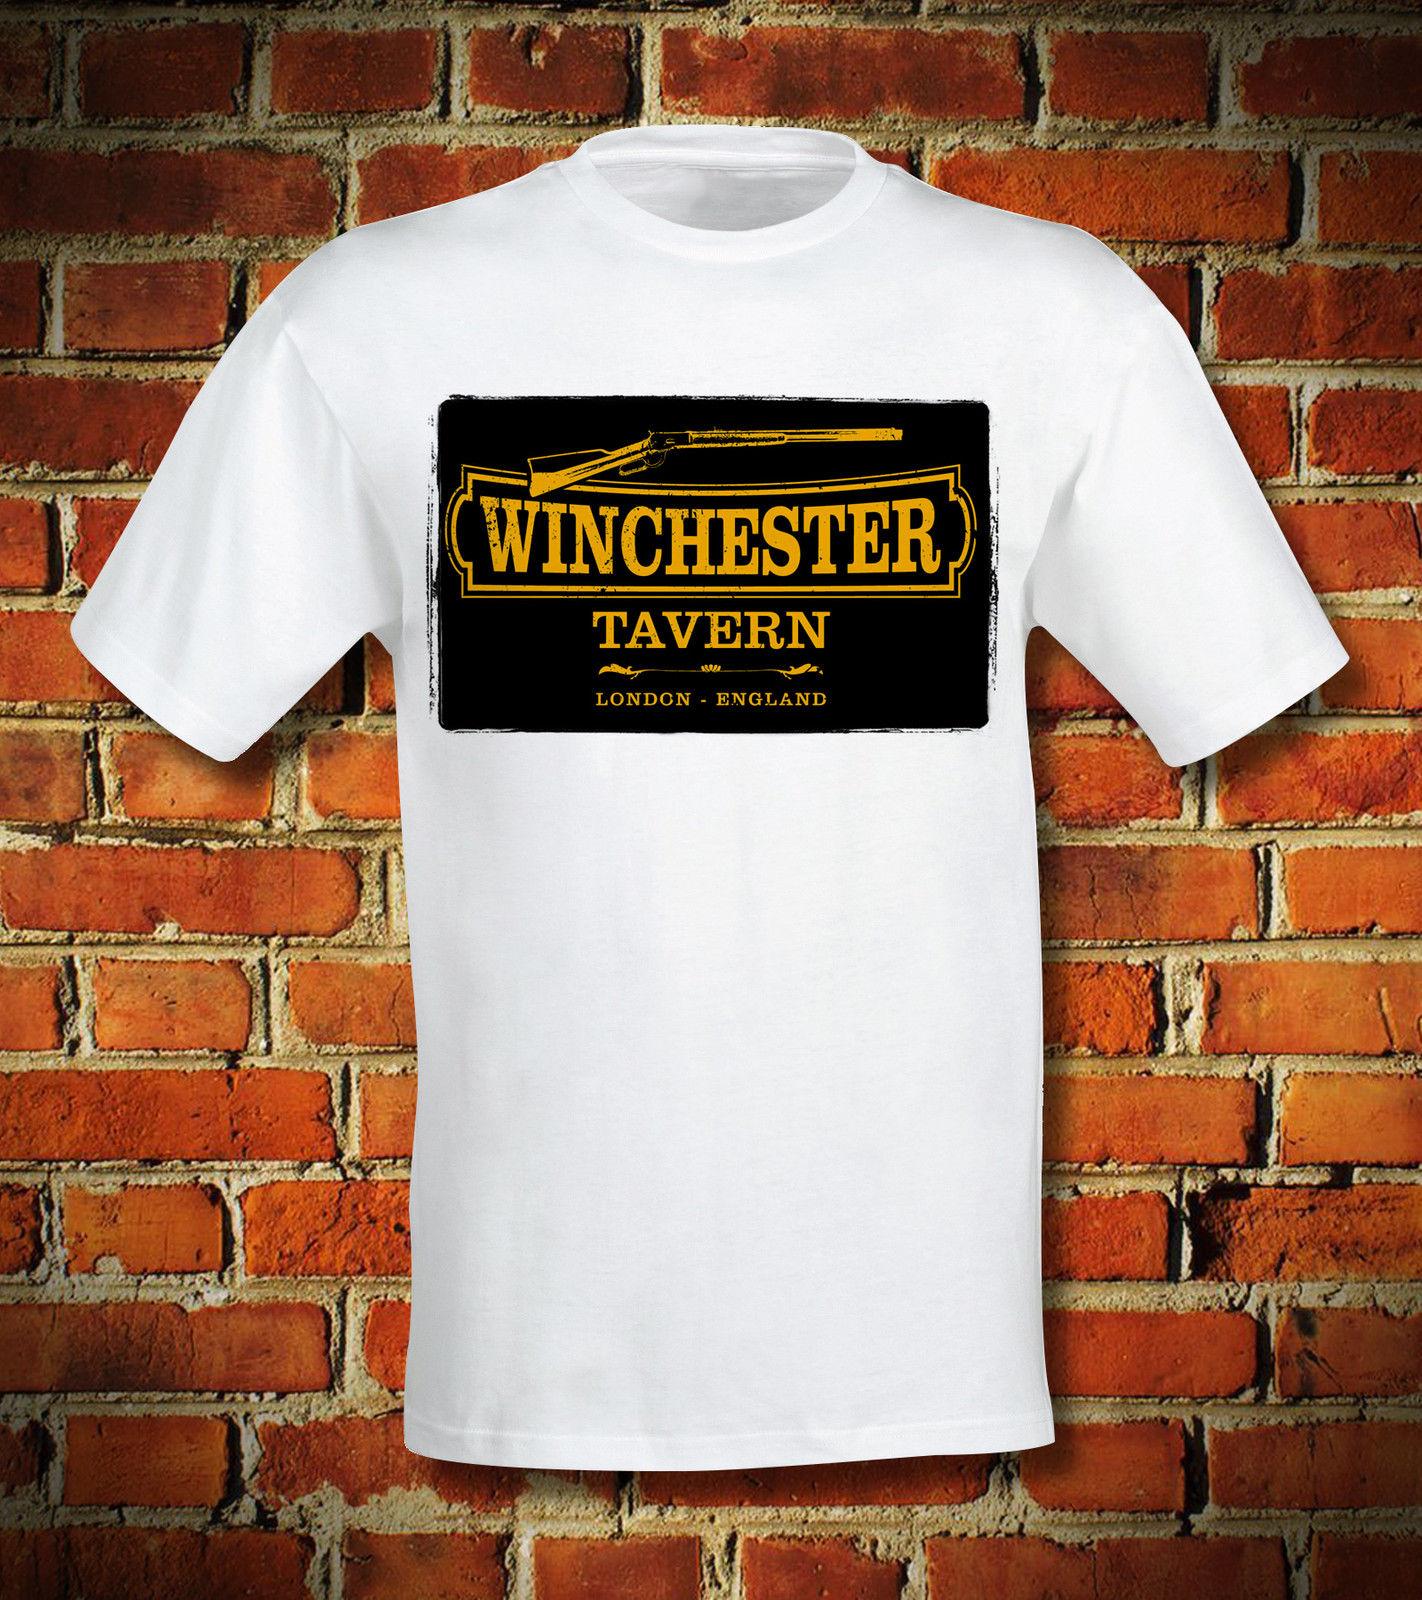 SHAUN de la camiseta muertos WINCHESTER taberna CORNETTO HORROR ZOMBIE